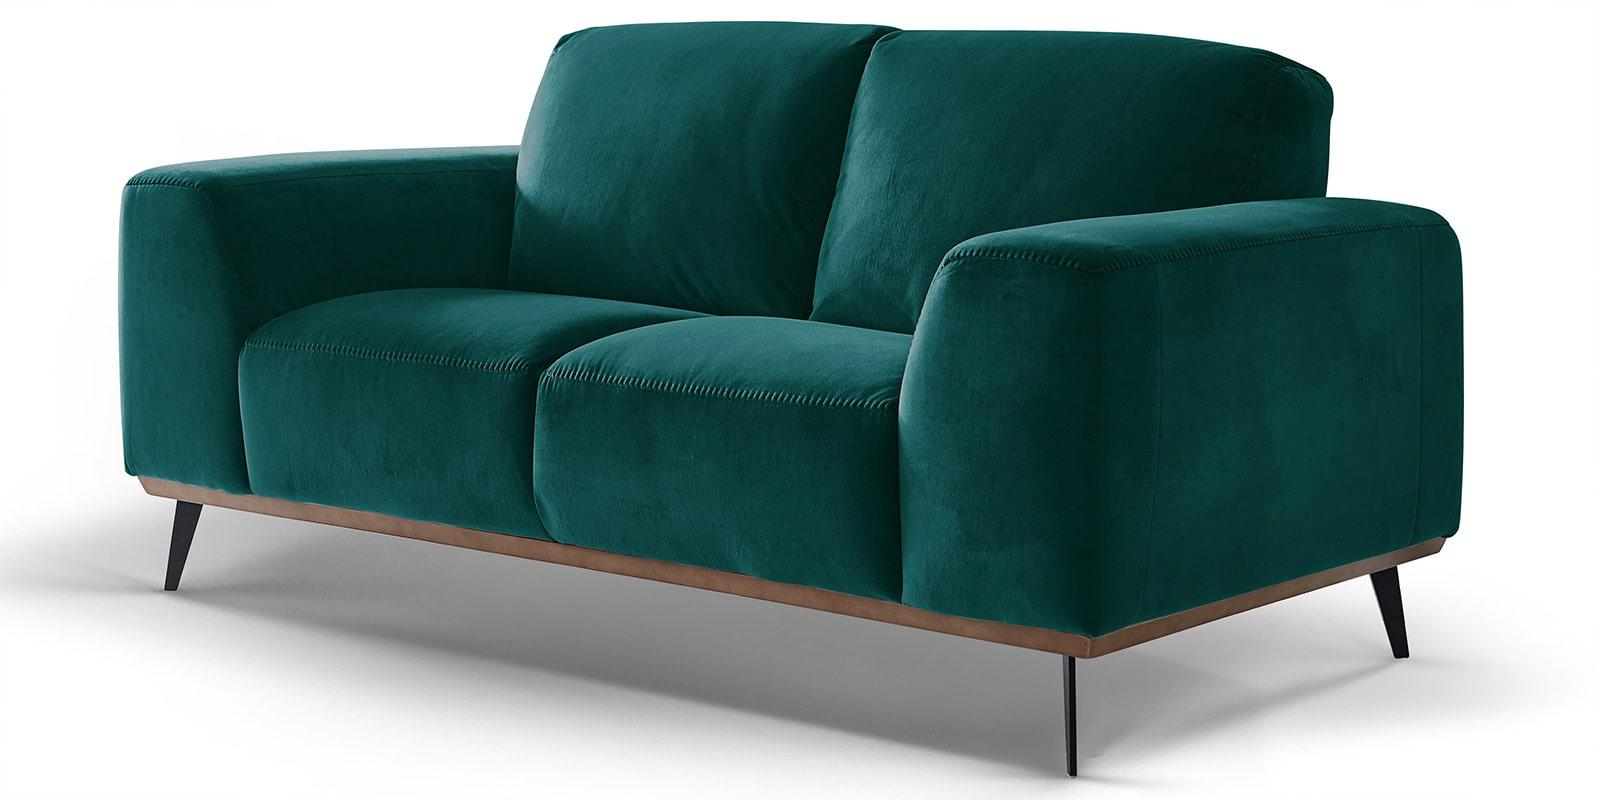 Moebella24 - 2-Sitzer - Sofa - Barcelona - Samt - Petrol - Skandinavisches - Design - Punto - cavallo - Nähte - Detailaufnahme